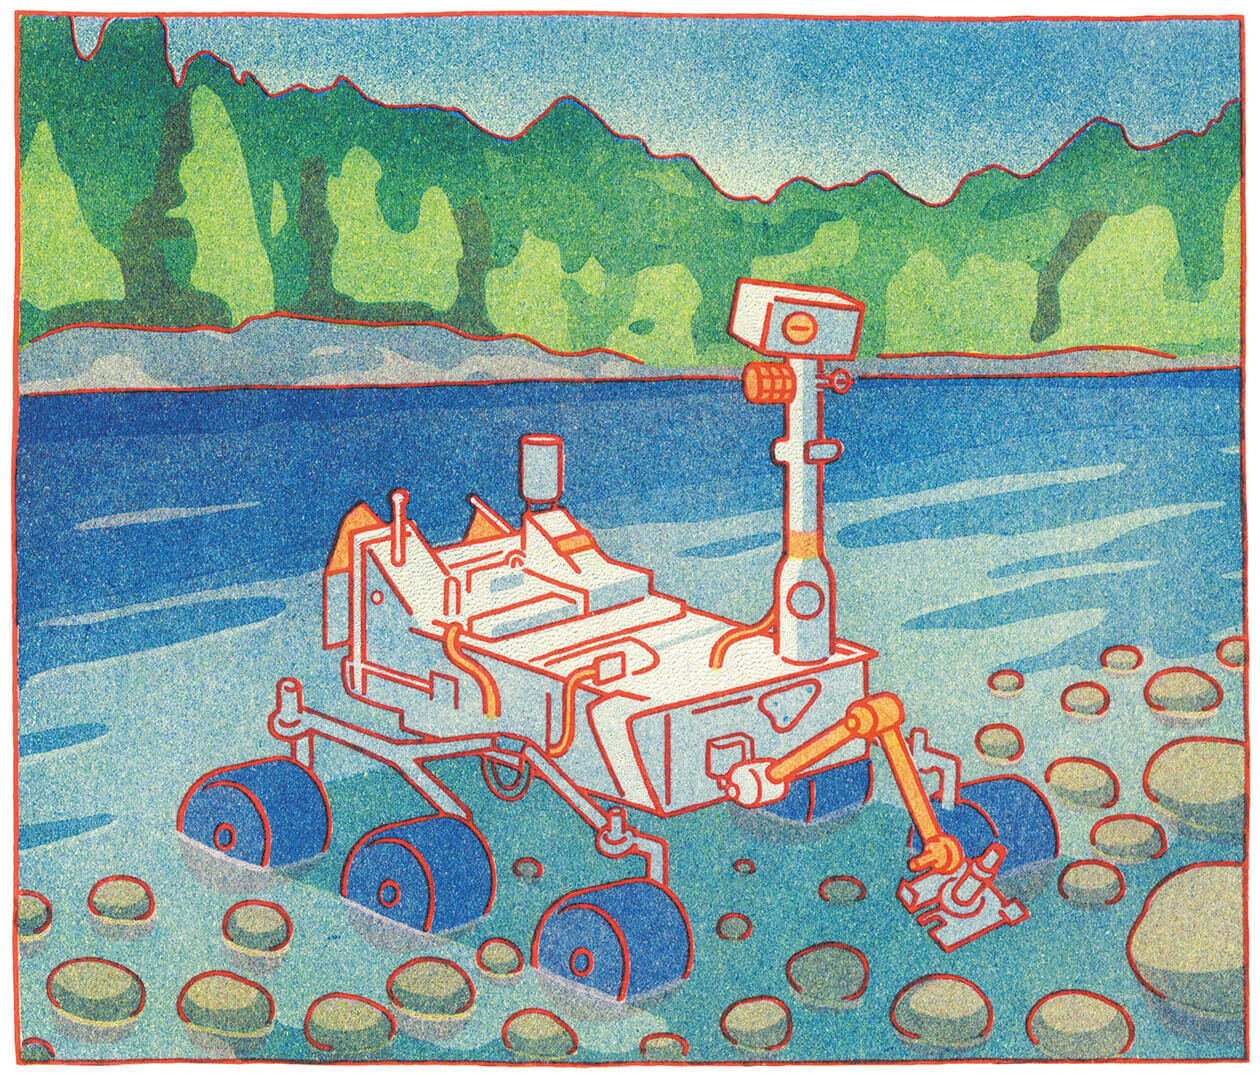 A land rover searches through rocks in a lake.